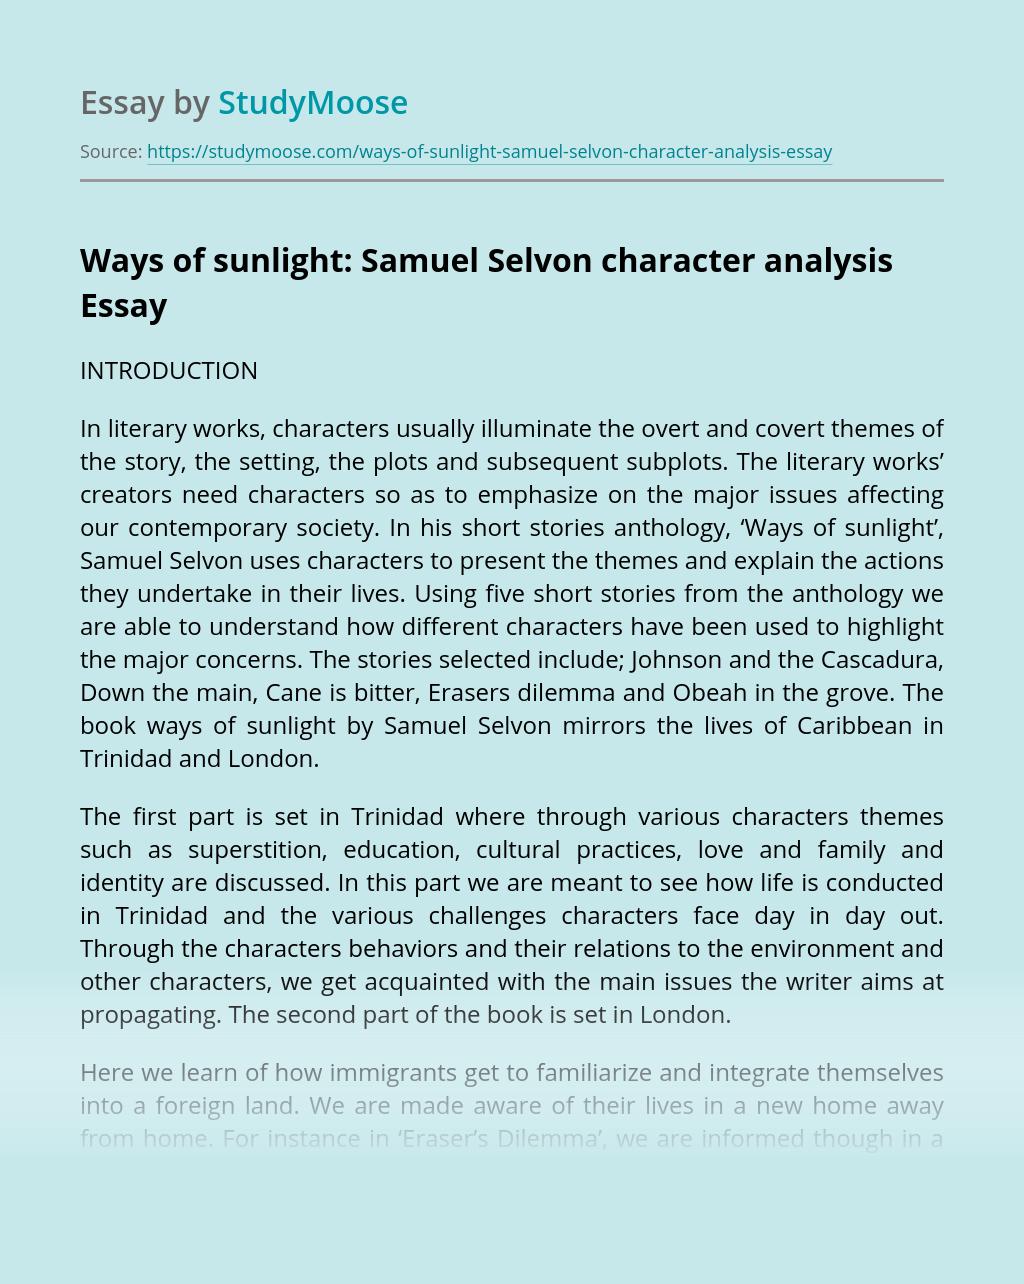 Ways of sunlight: Samuel Selvon character analysis